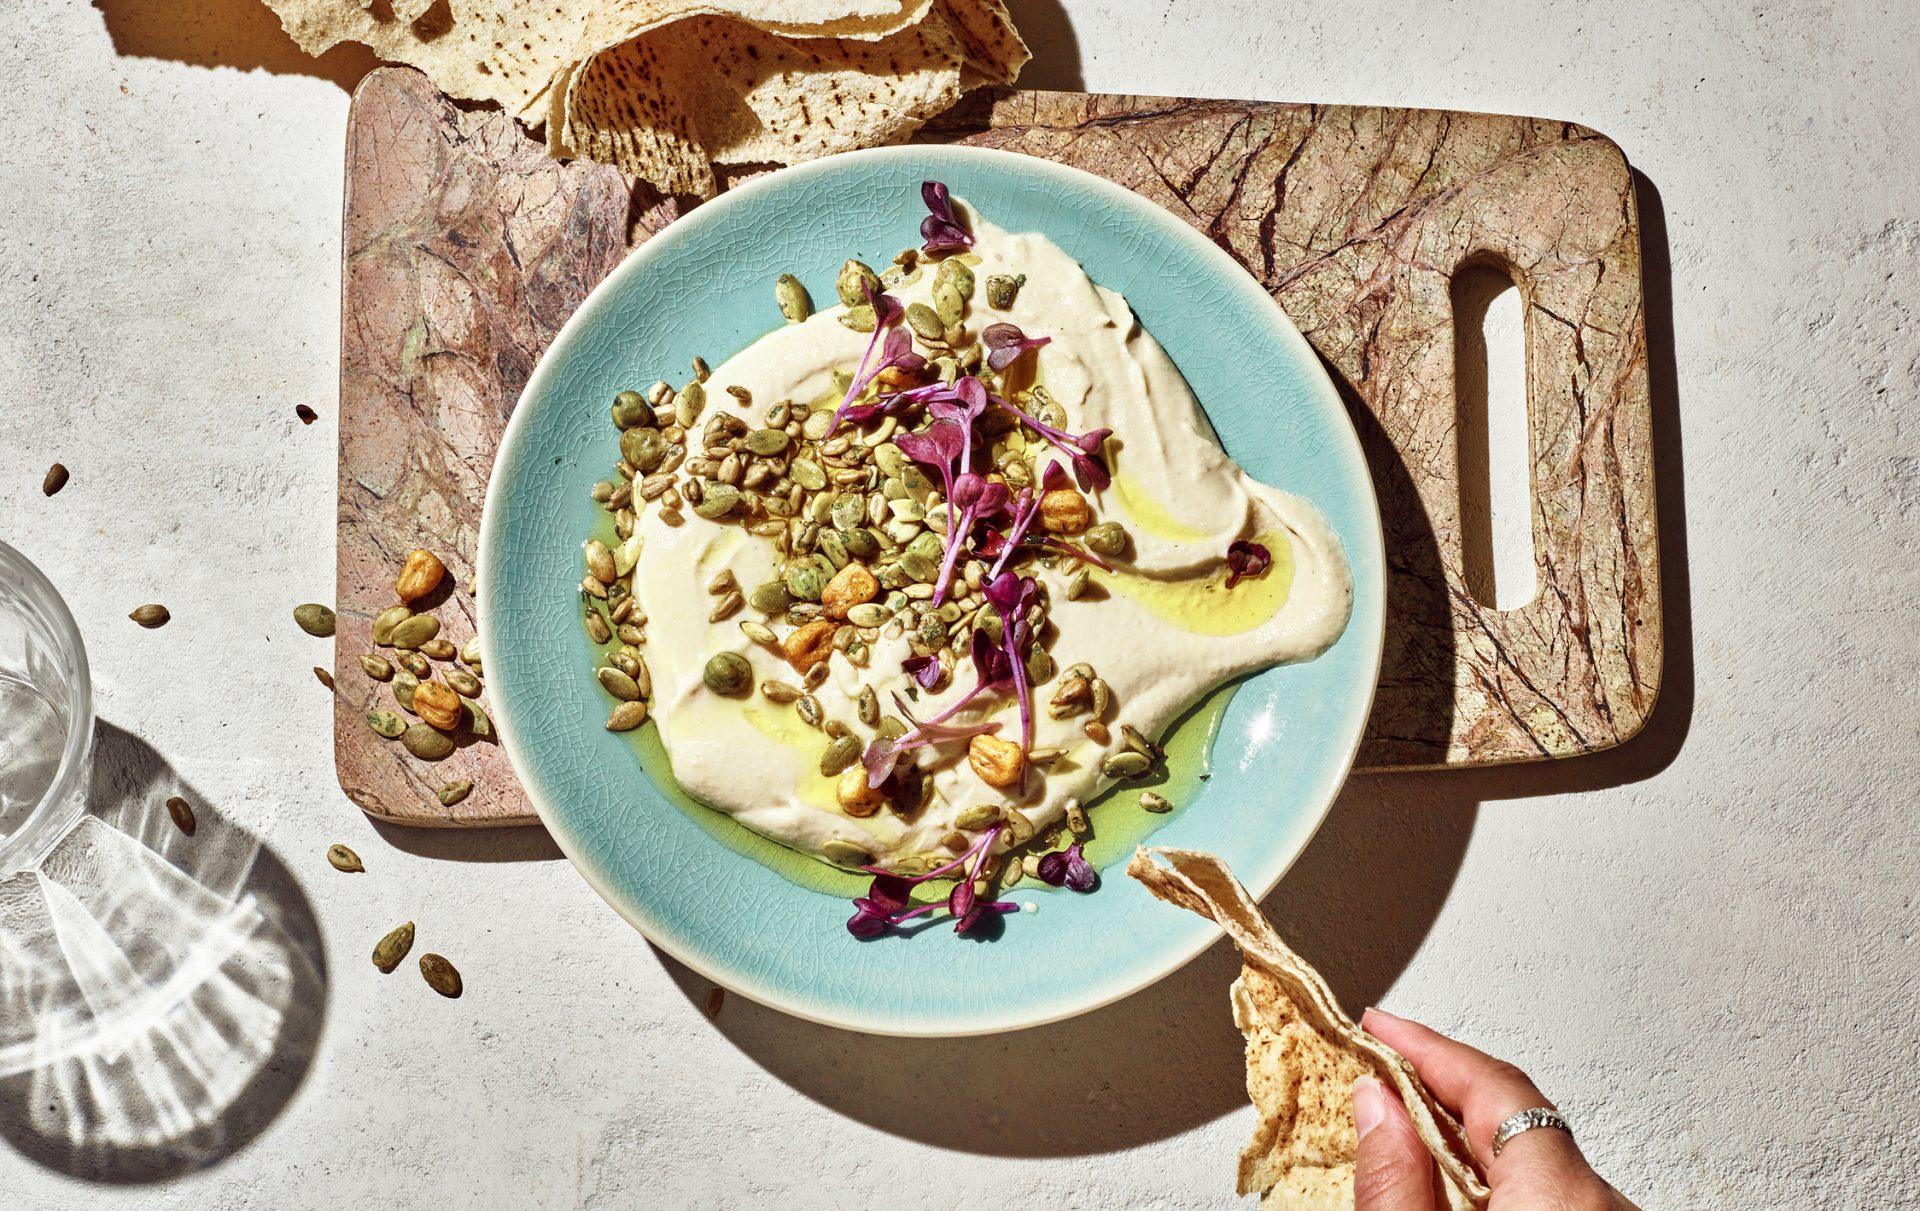 a photo of a hummus recipe with carman's chilli corn crunch